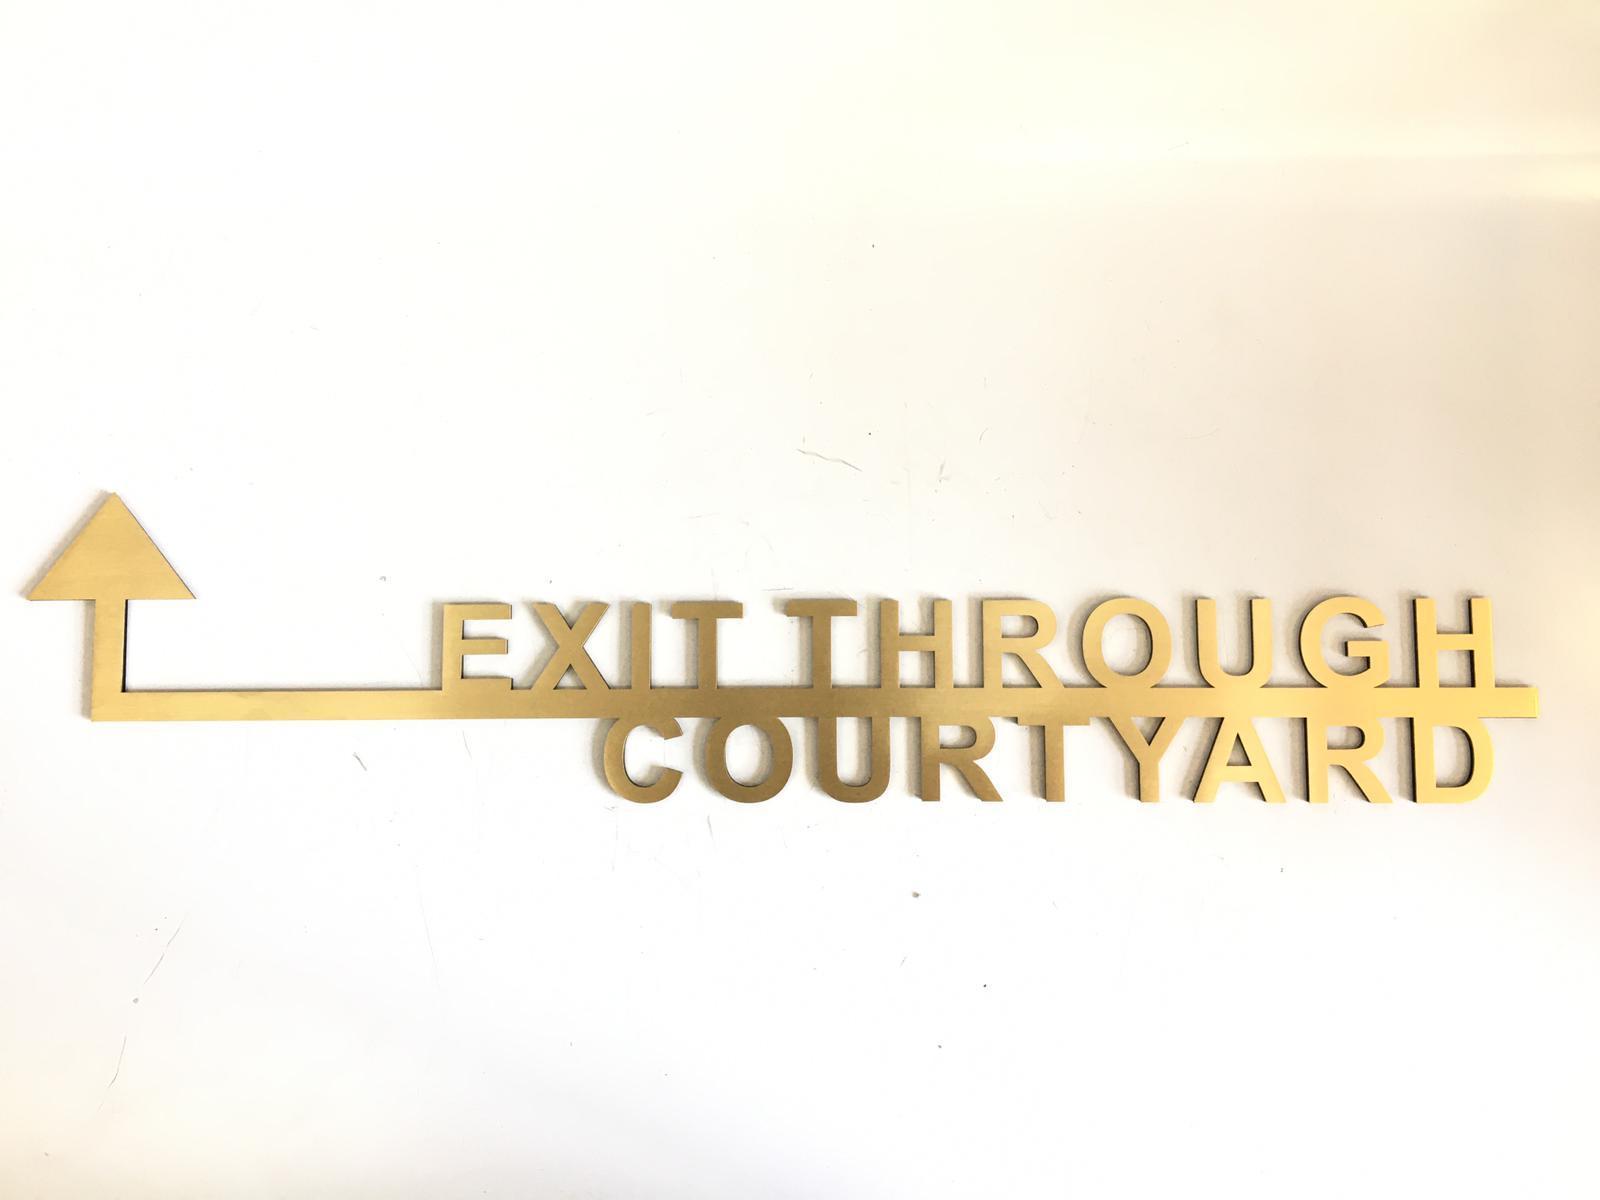 Exit Redirect